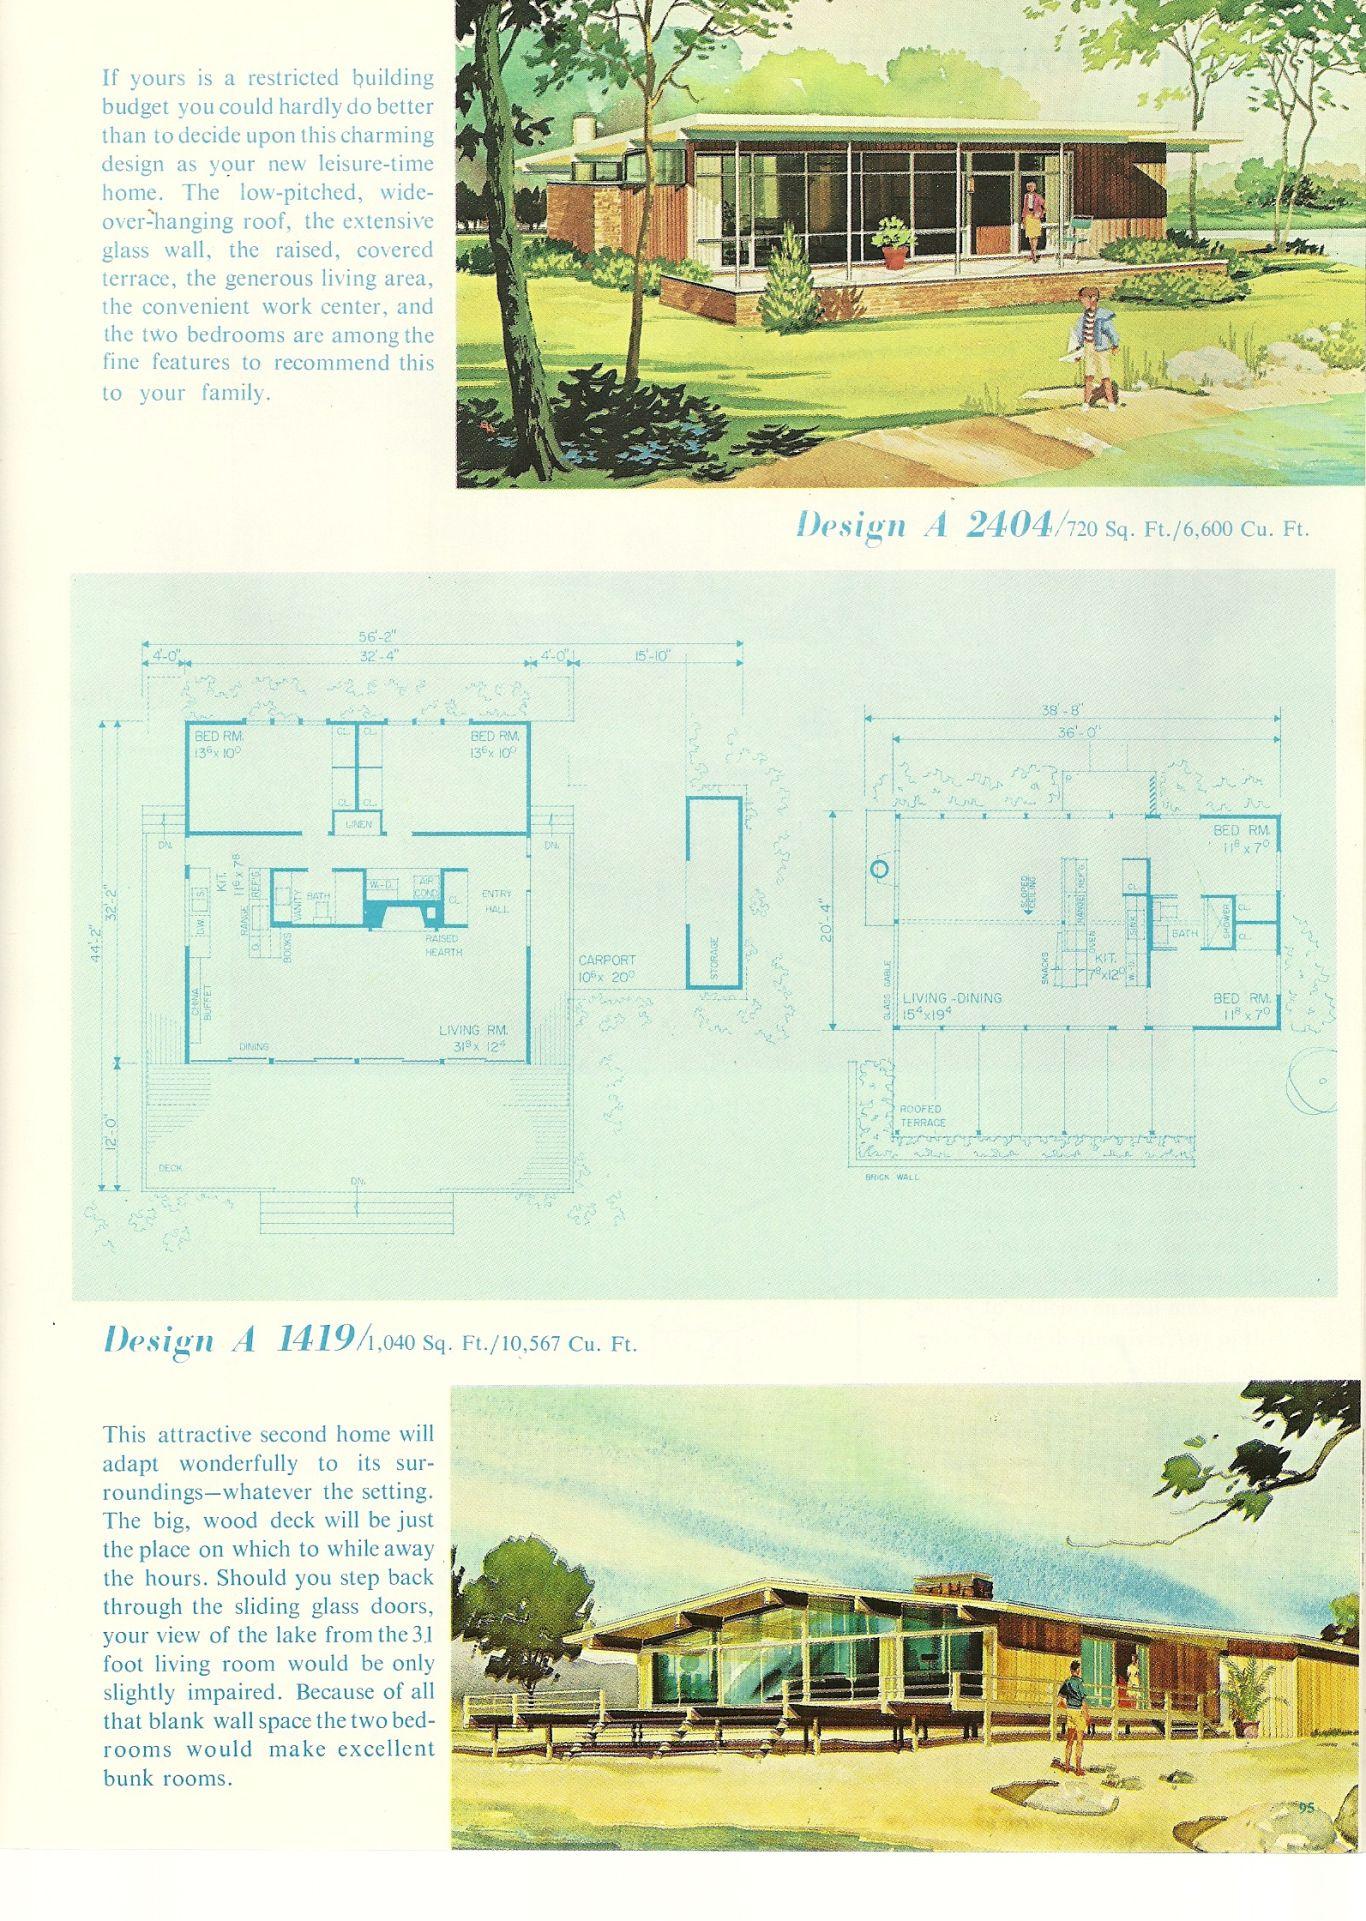 Vintage Vacation Homes 149 Vintage House Plans Vacation House Plans Mid Century Modern House Plans